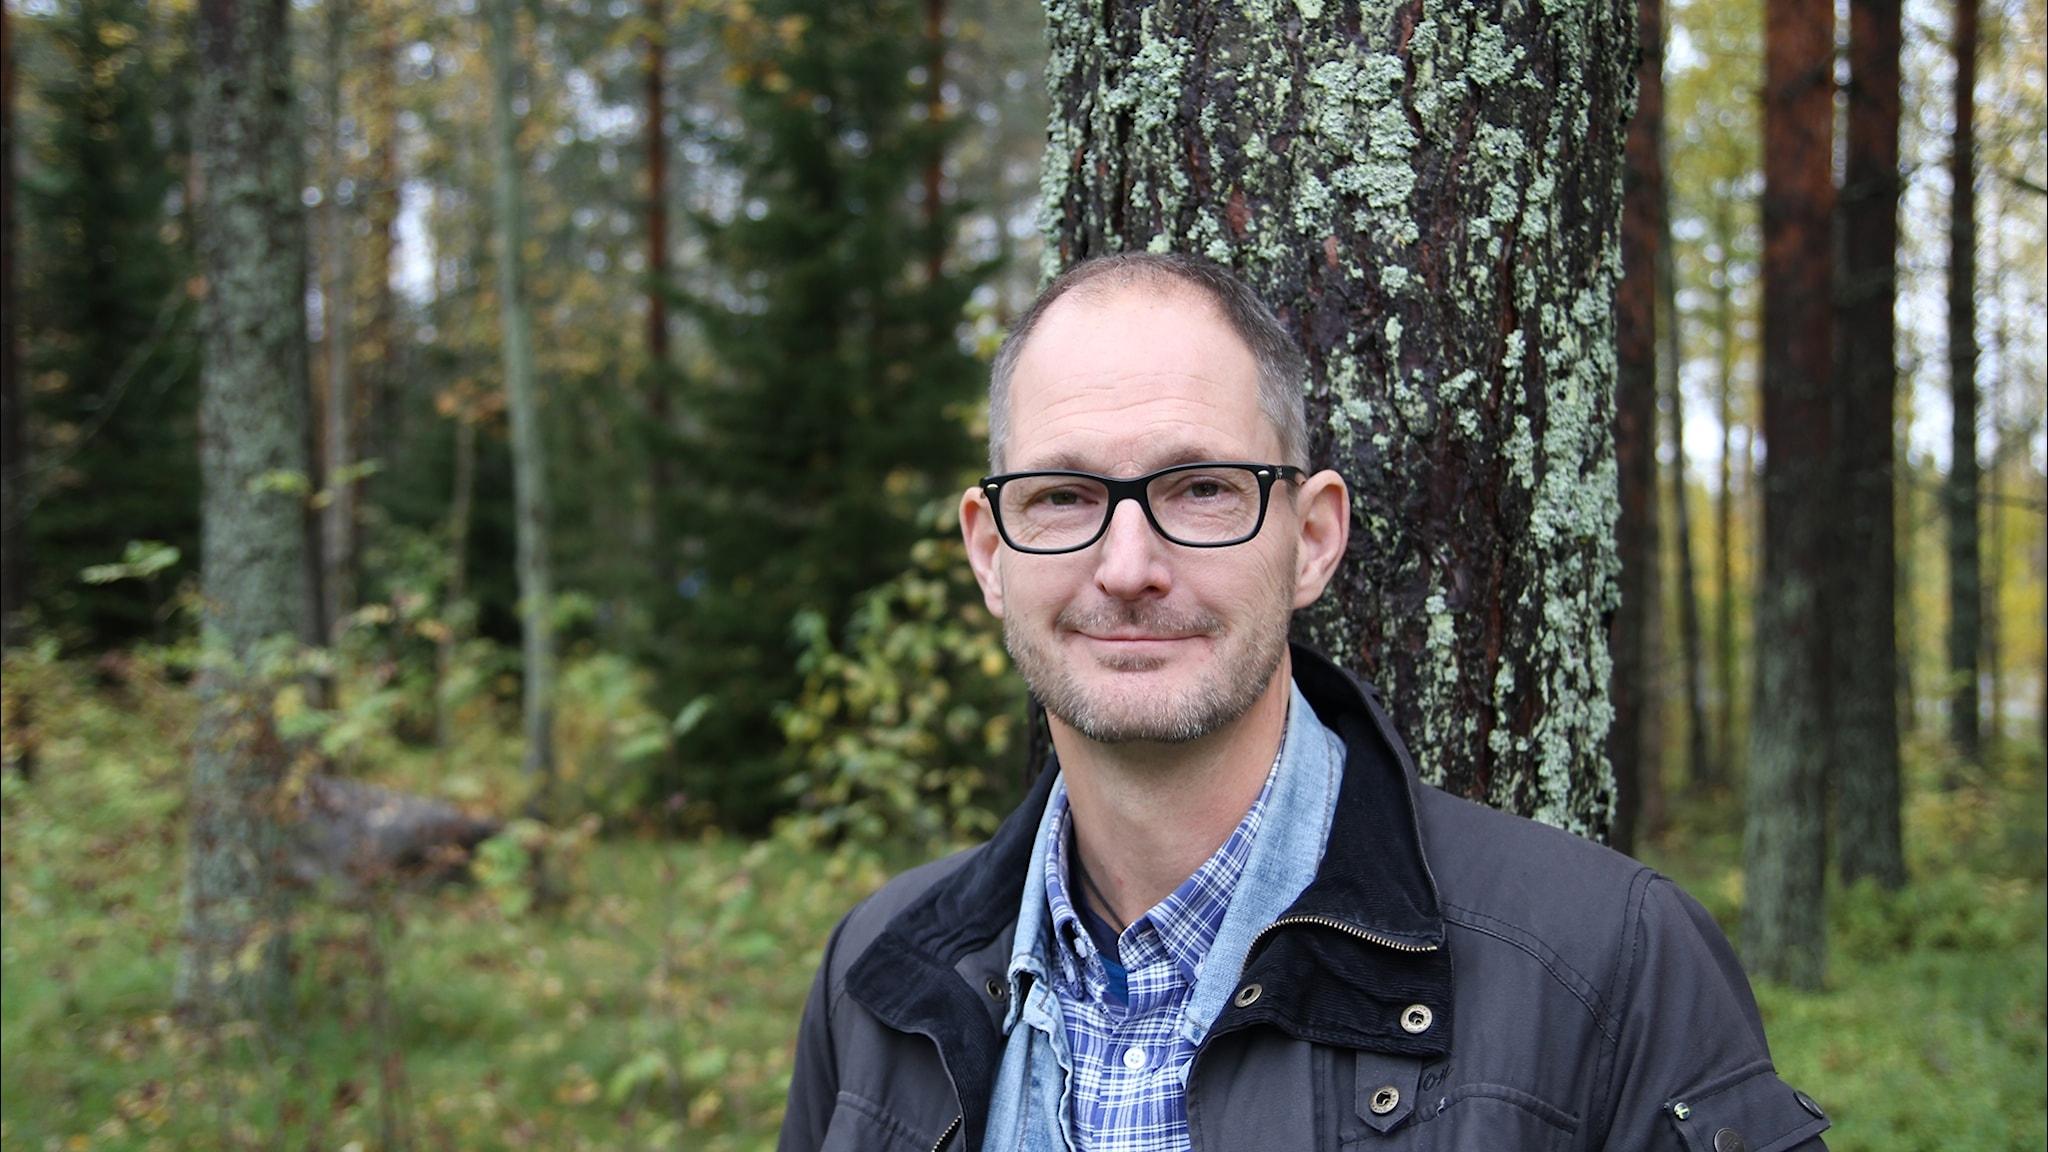 Min plats i helheten - Mattias Hjalmarsson